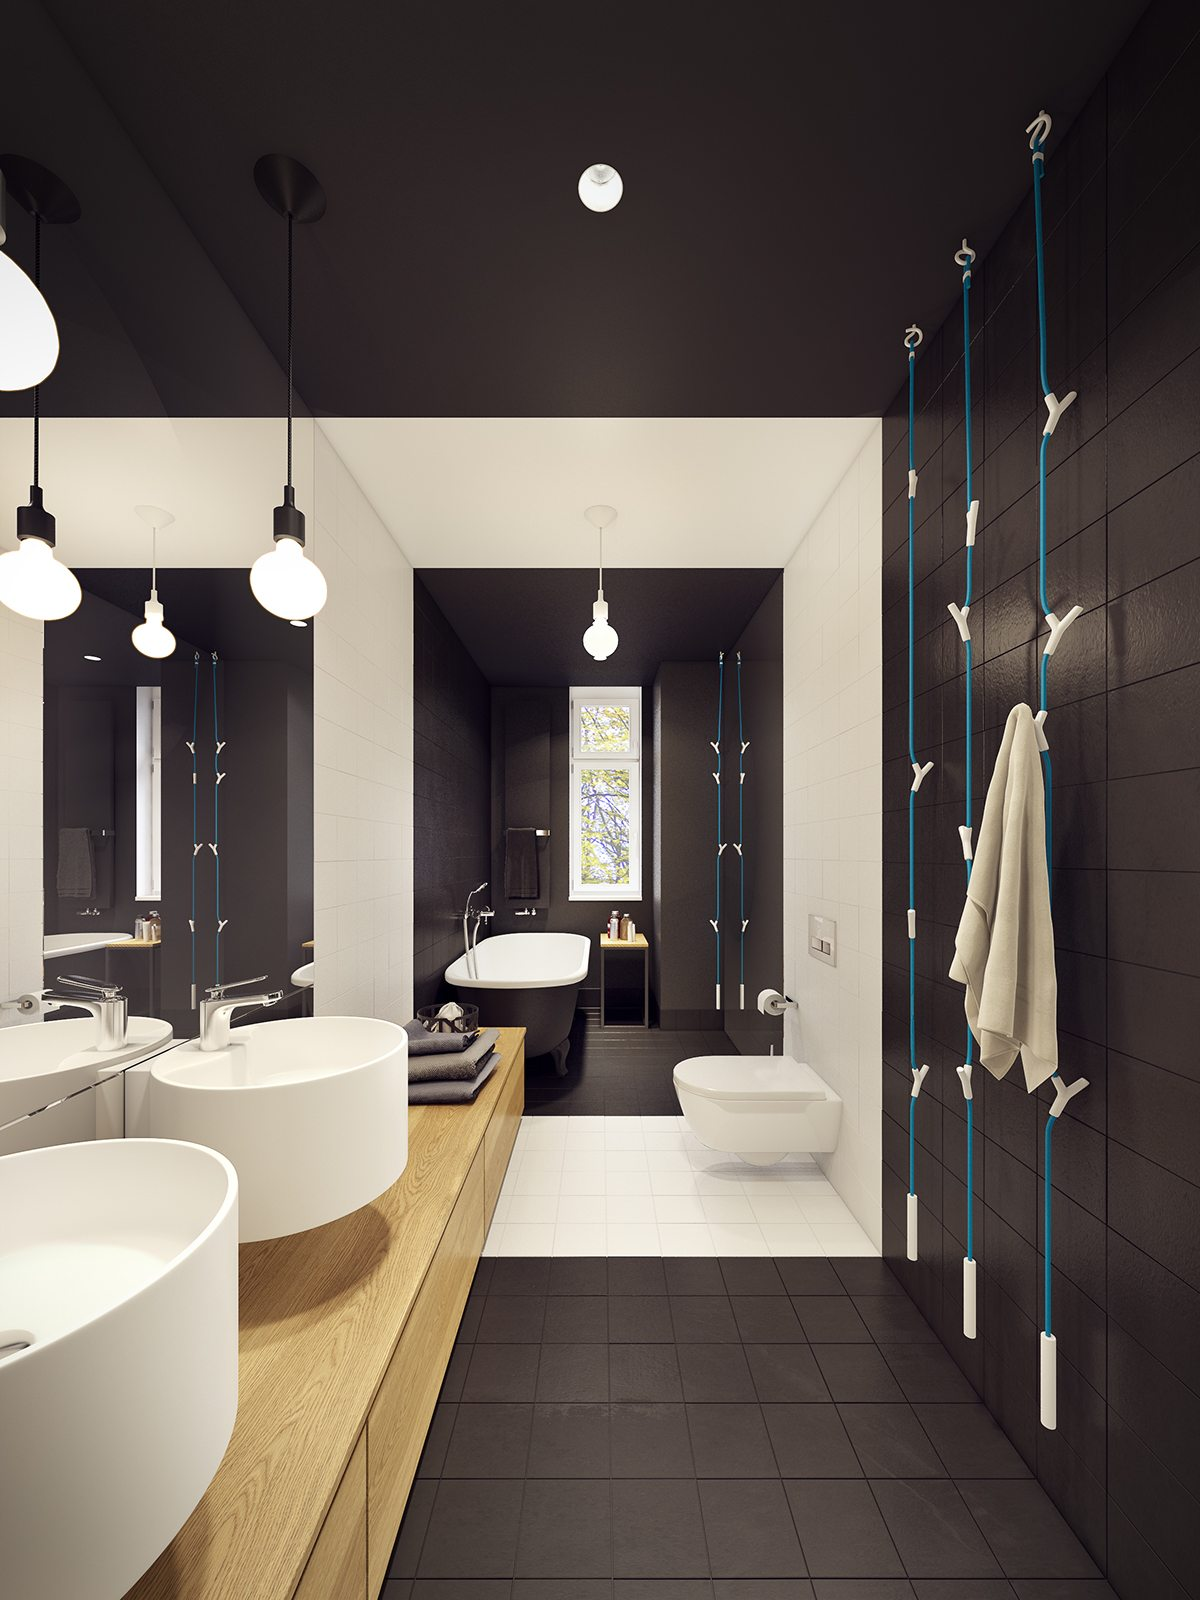 Applying A Trendy Bathroom Designs Which Arranged With A